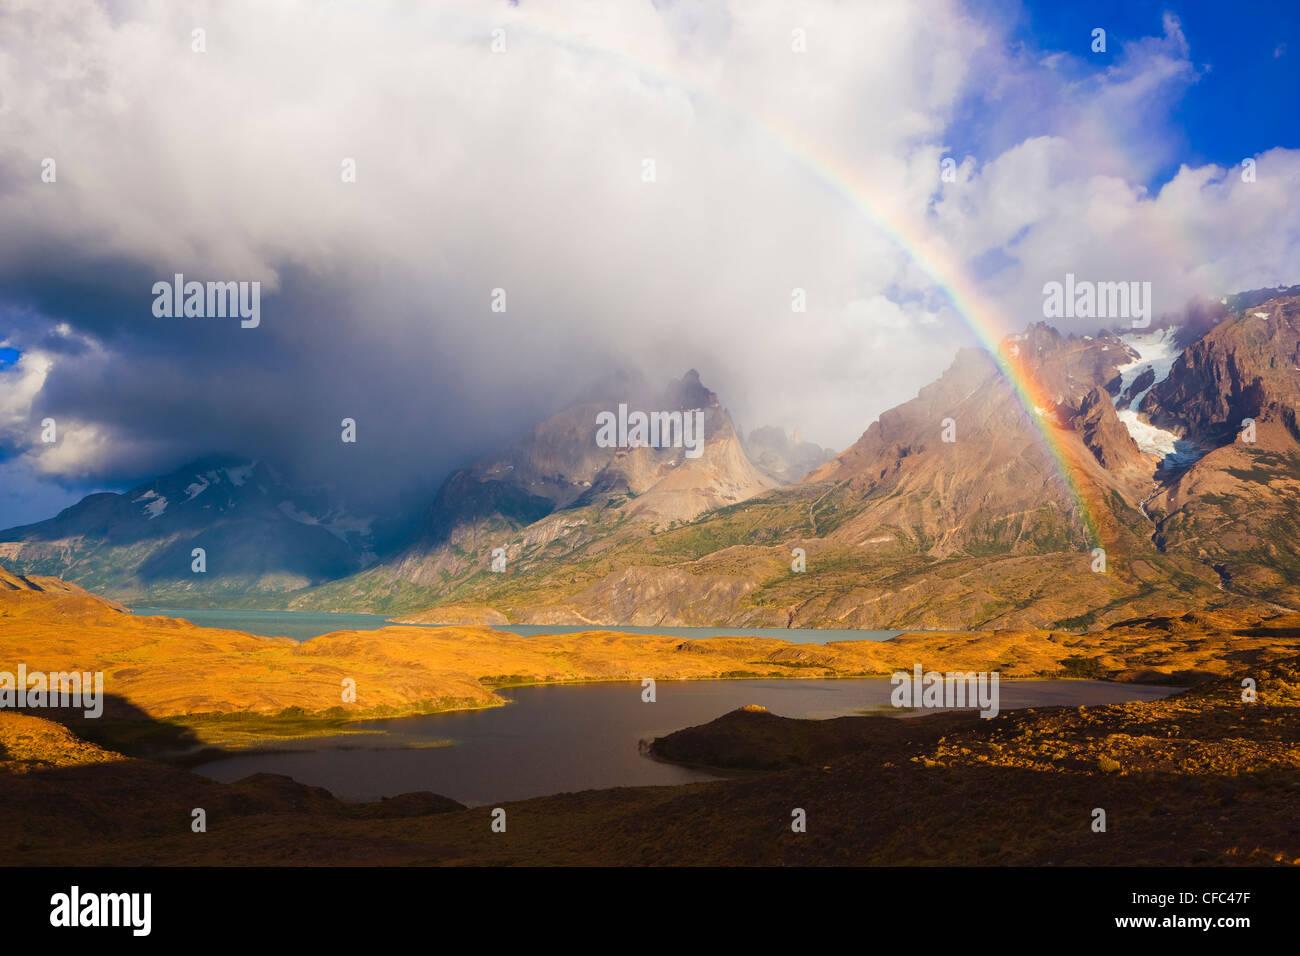 Rainbow e Cuernos del Paine di Sunrise, Parco Nazionale Torres del Paine, Patagonia, Cile Immagini Stock